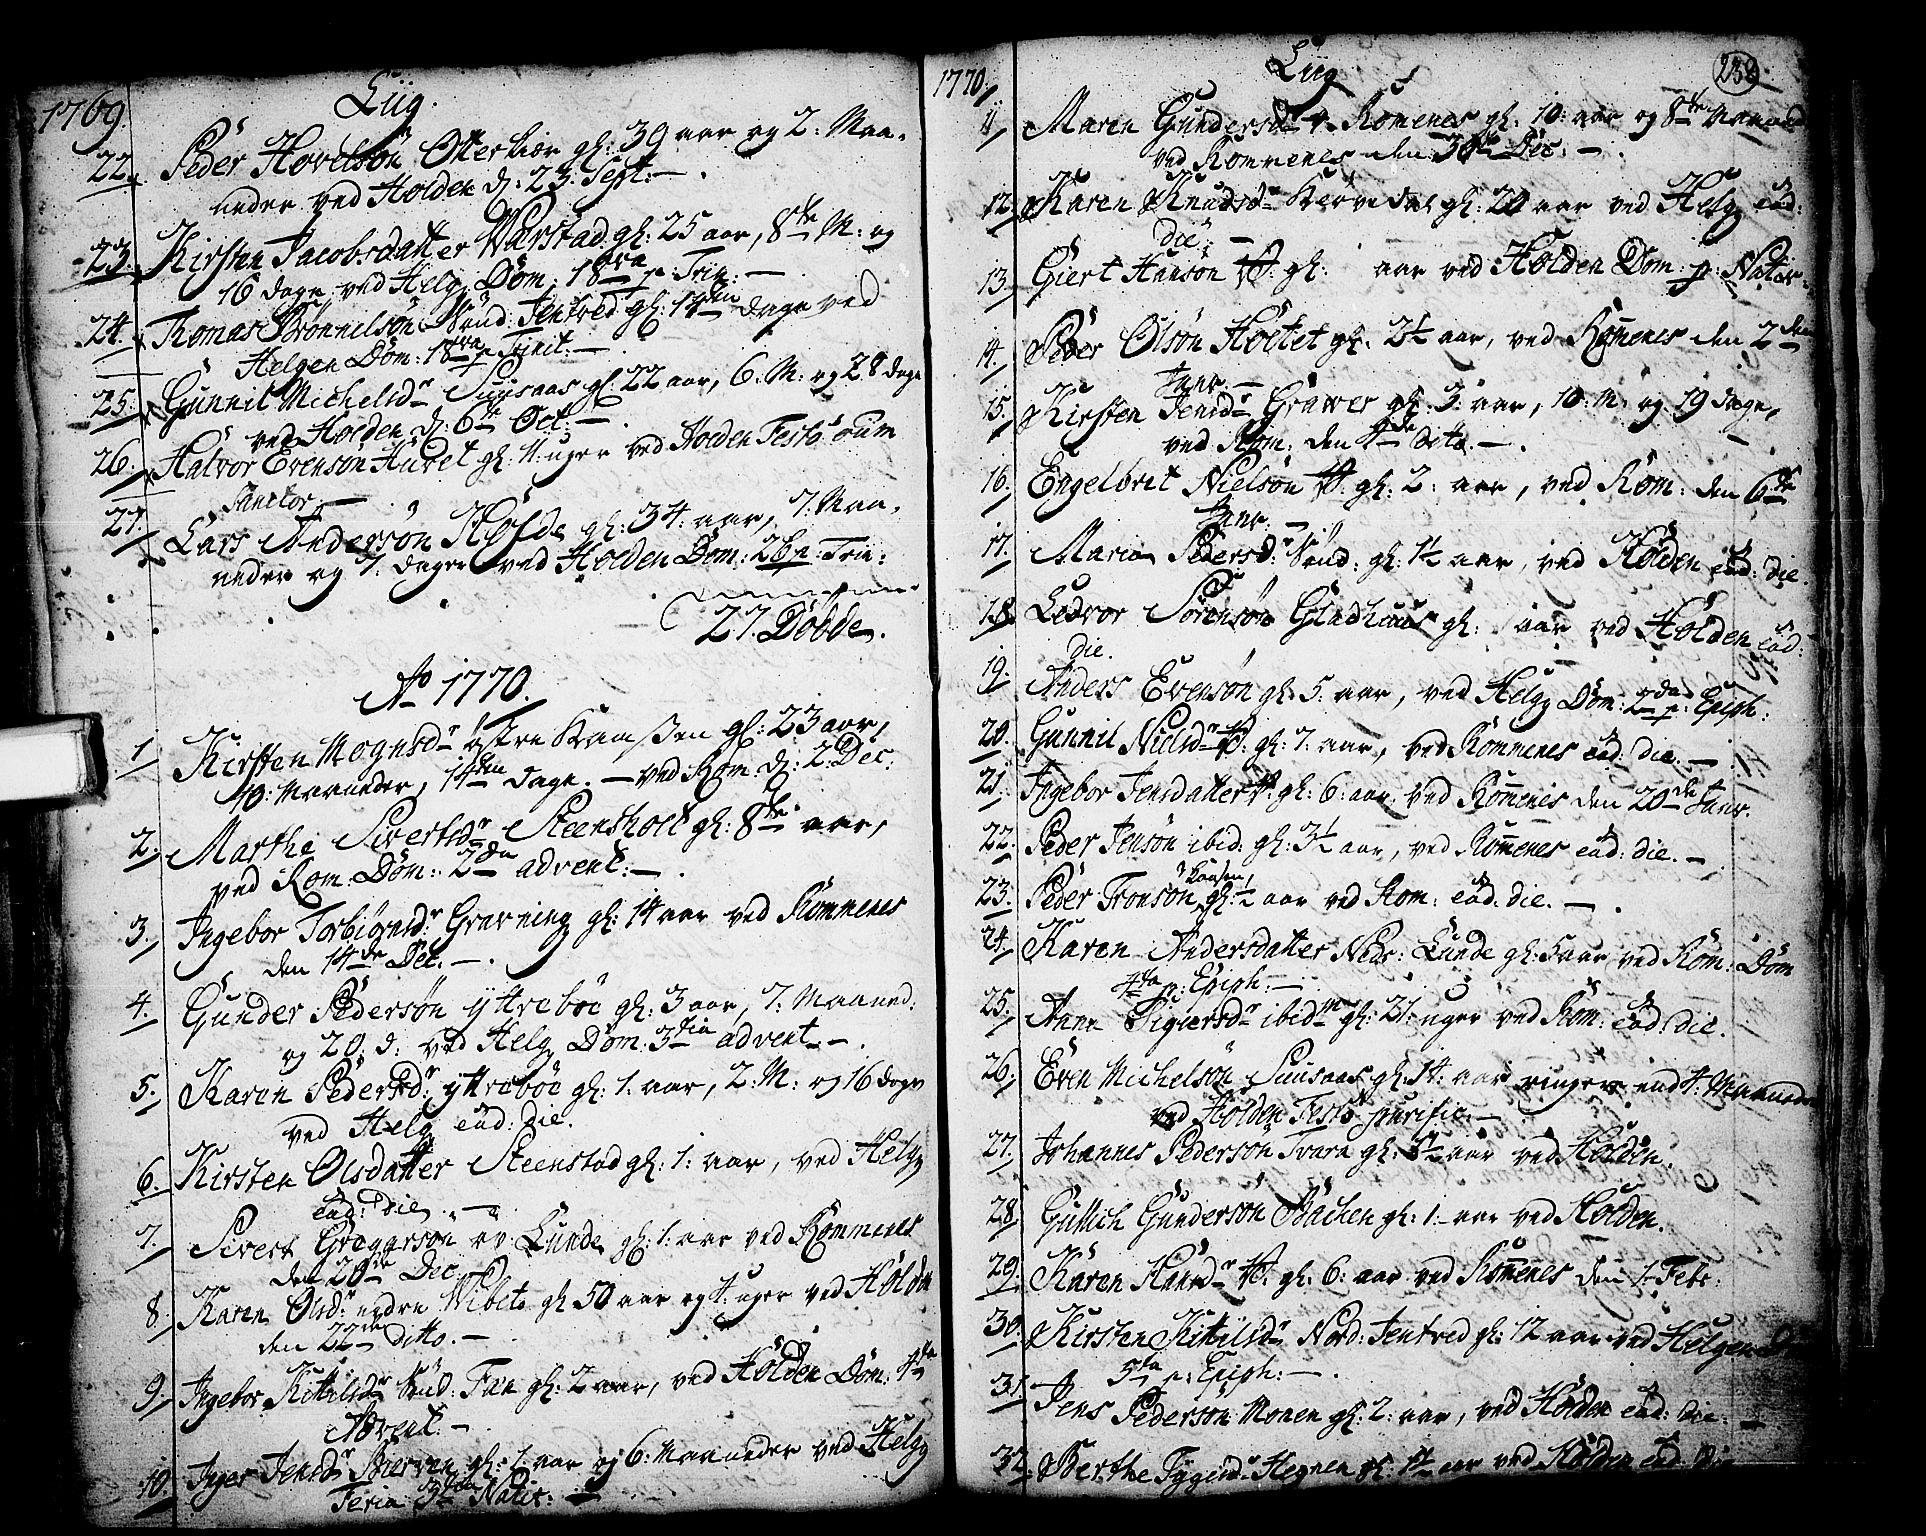 SAKO, Holla kirkebøker, F/Fa/L0001: Ministerialbok nr. 1, 1717-1779, s. 238